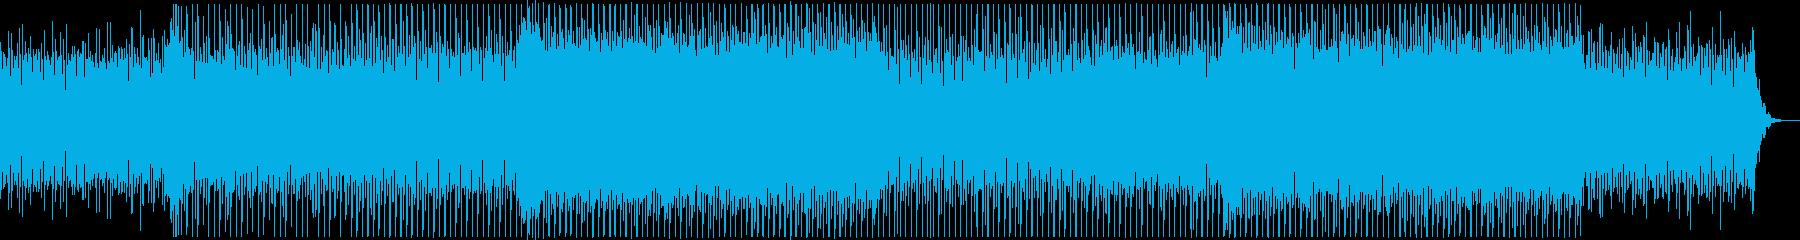 Bright electro, corporate VP's reproduced waveform